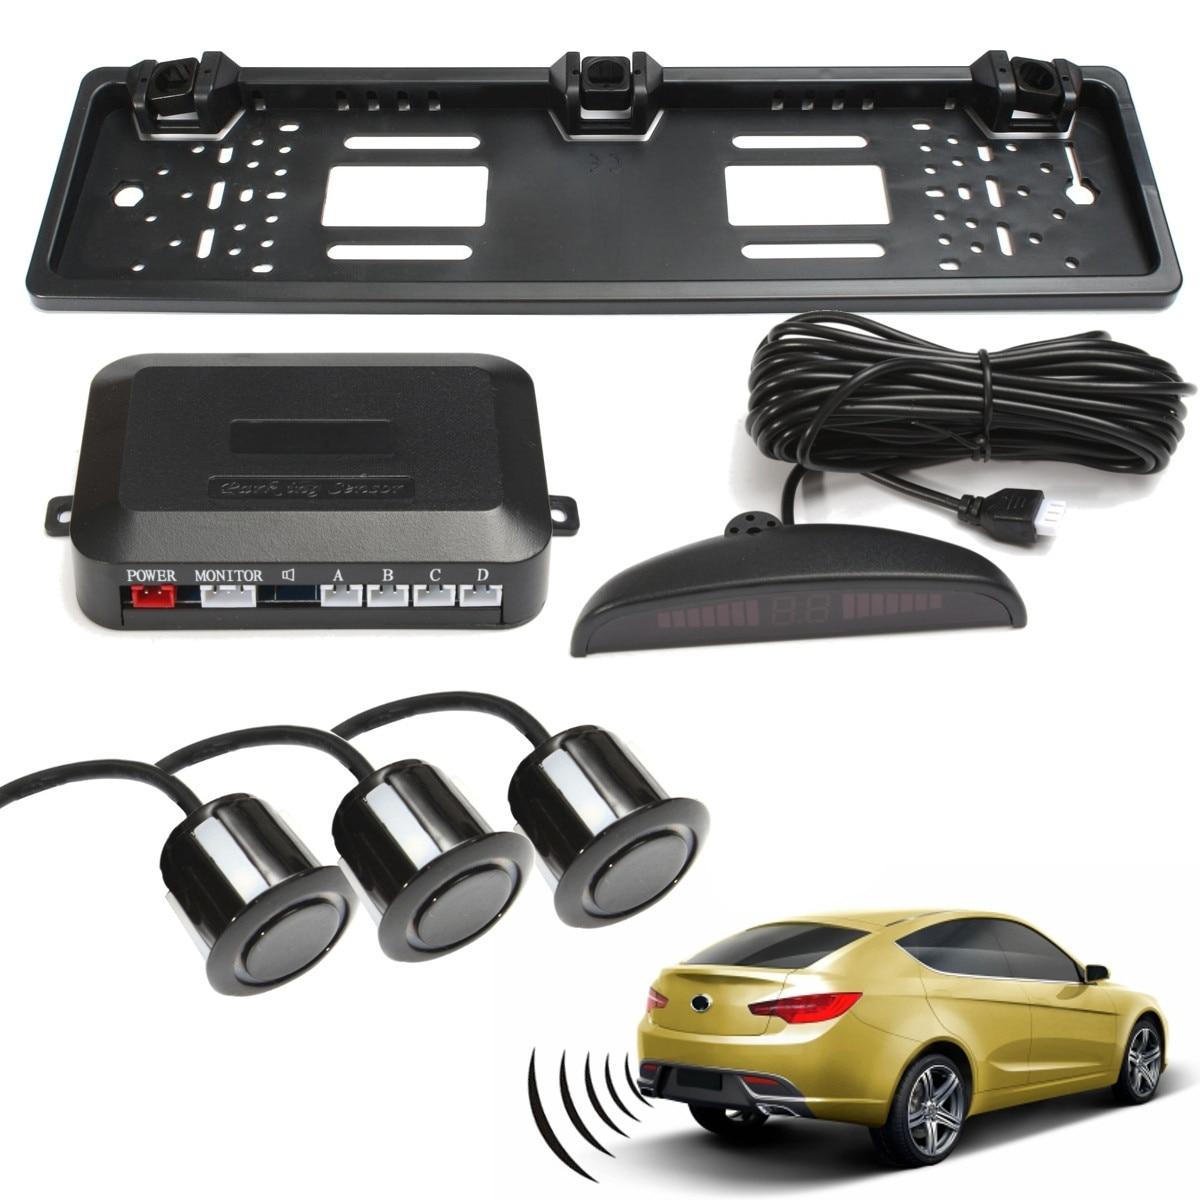 Universial 자동차 자동 Parktronic LED 주차 레이더 센서 시스템 모니터 디스플레이 4 센서 EU Lisence 플레이트 후면보기 카메라-에서주차 센서부터 자동차 및 오토바이 의